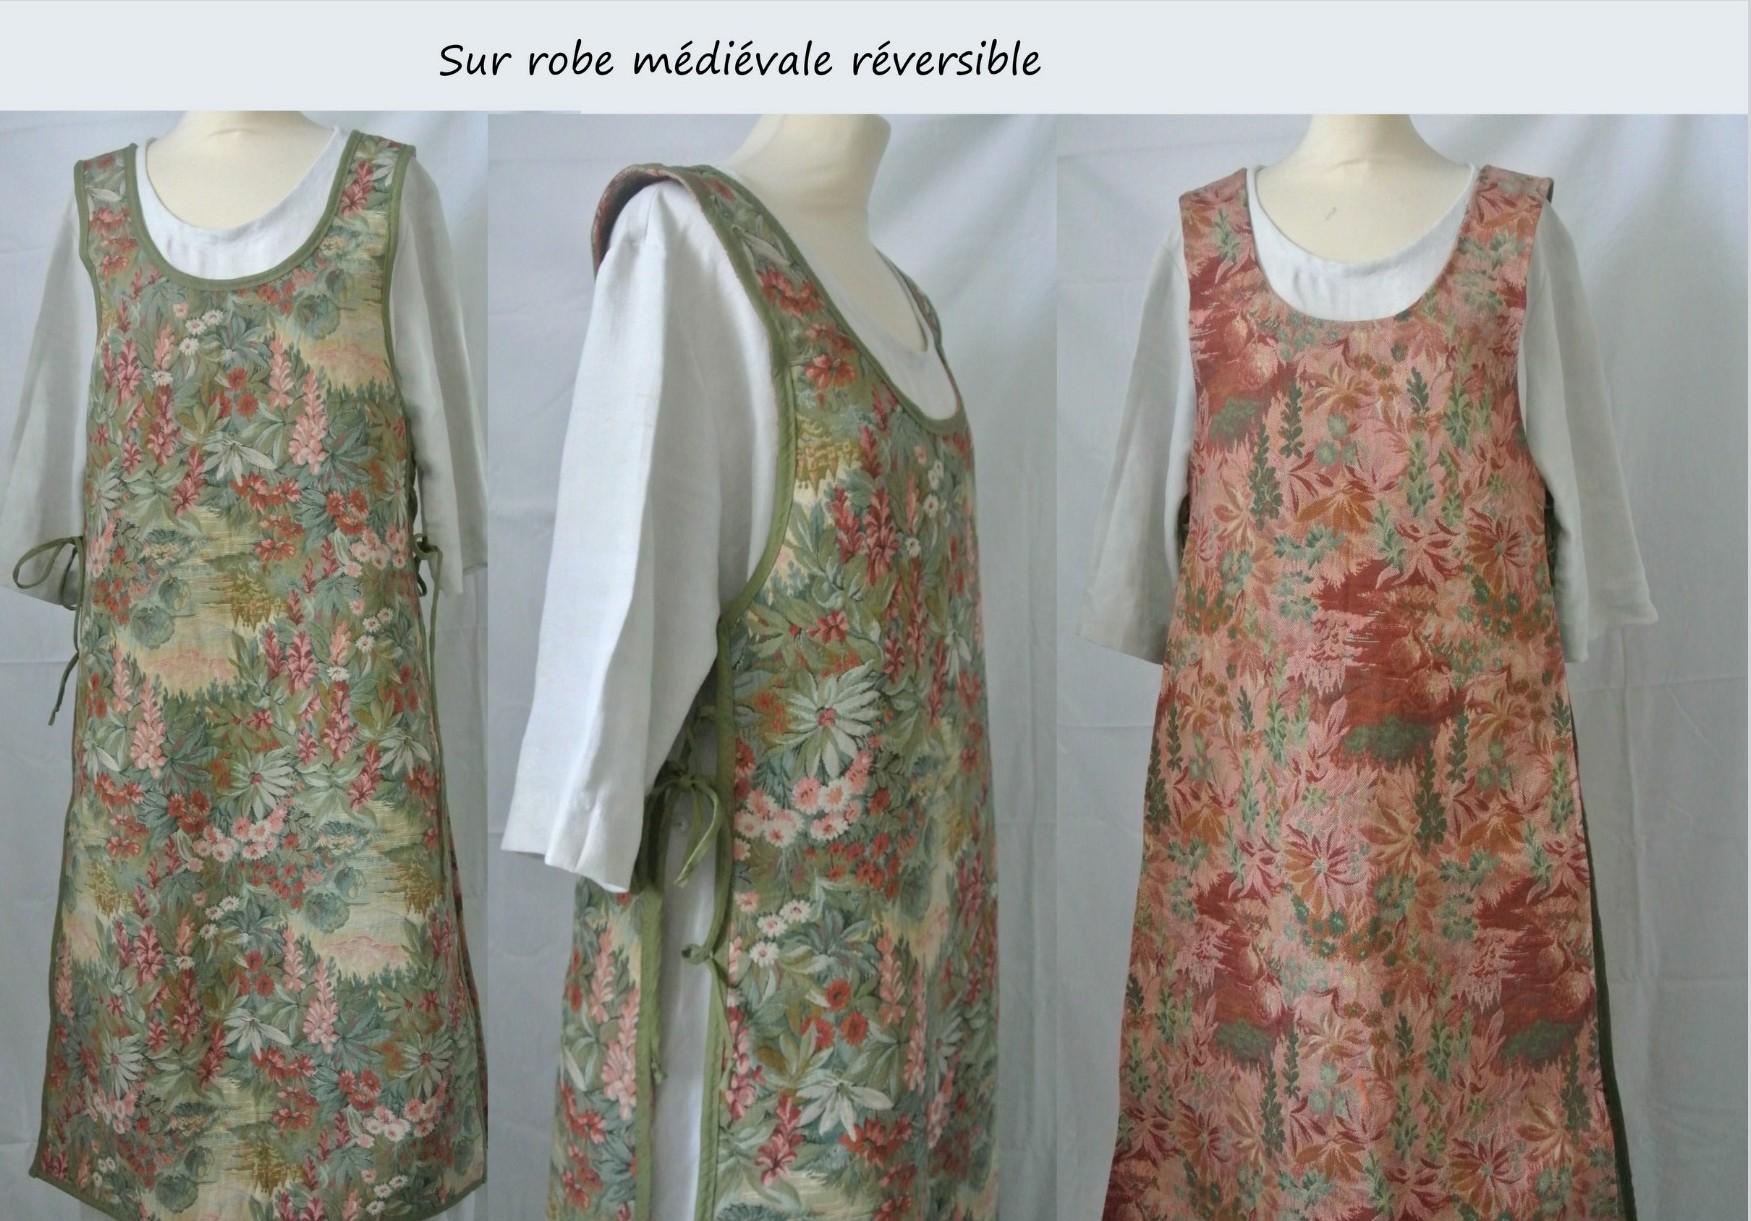 Sur robe médiévale